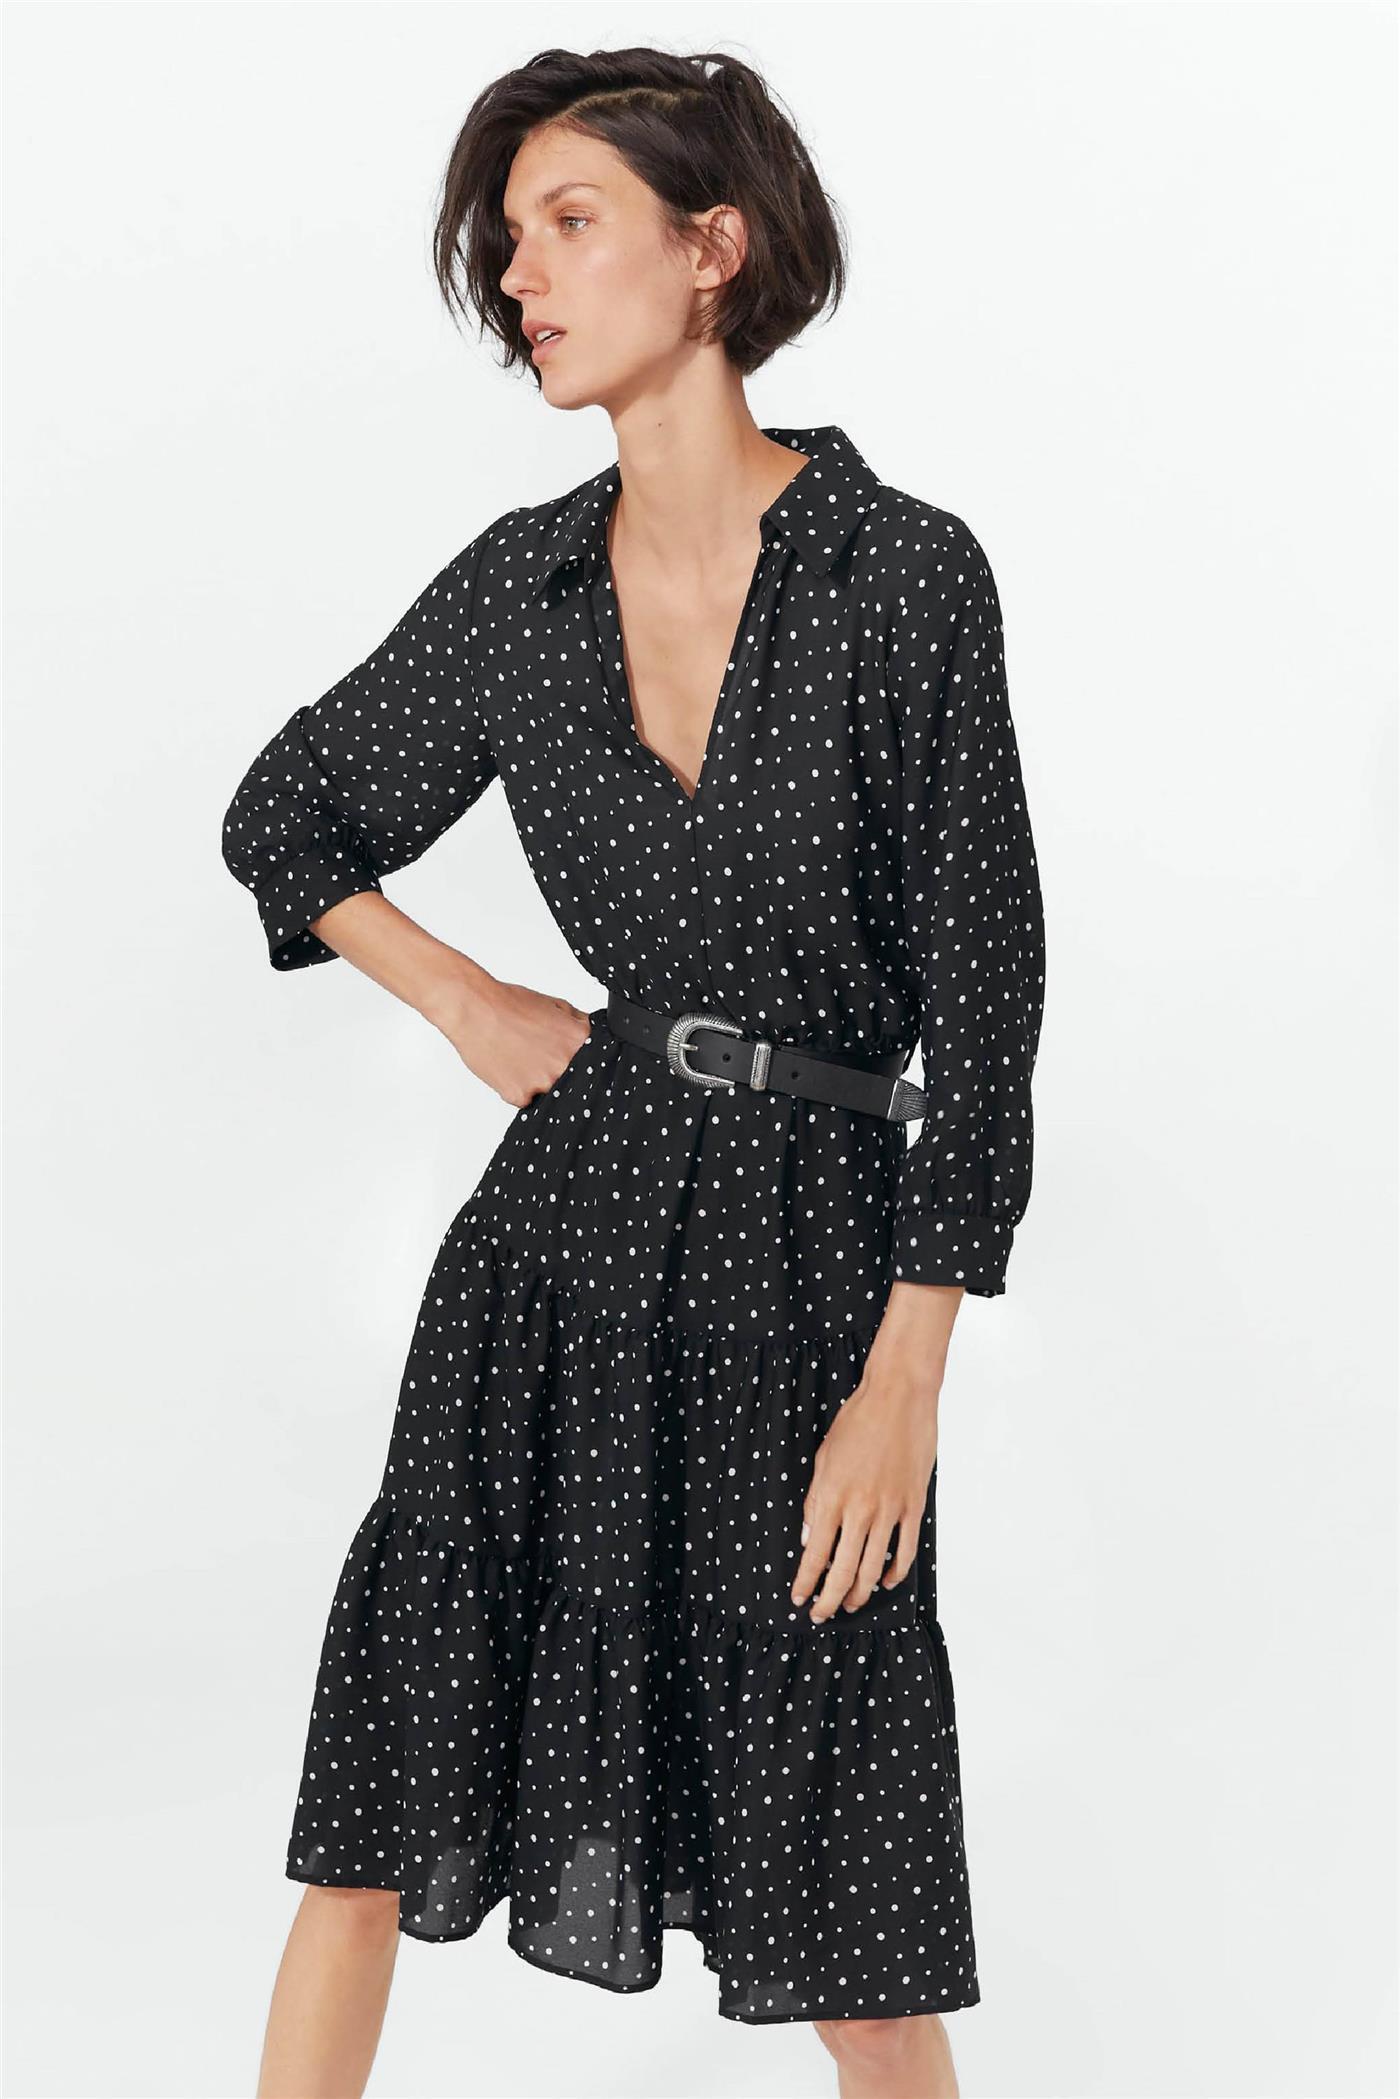 Vestidos de verano 2019 zara